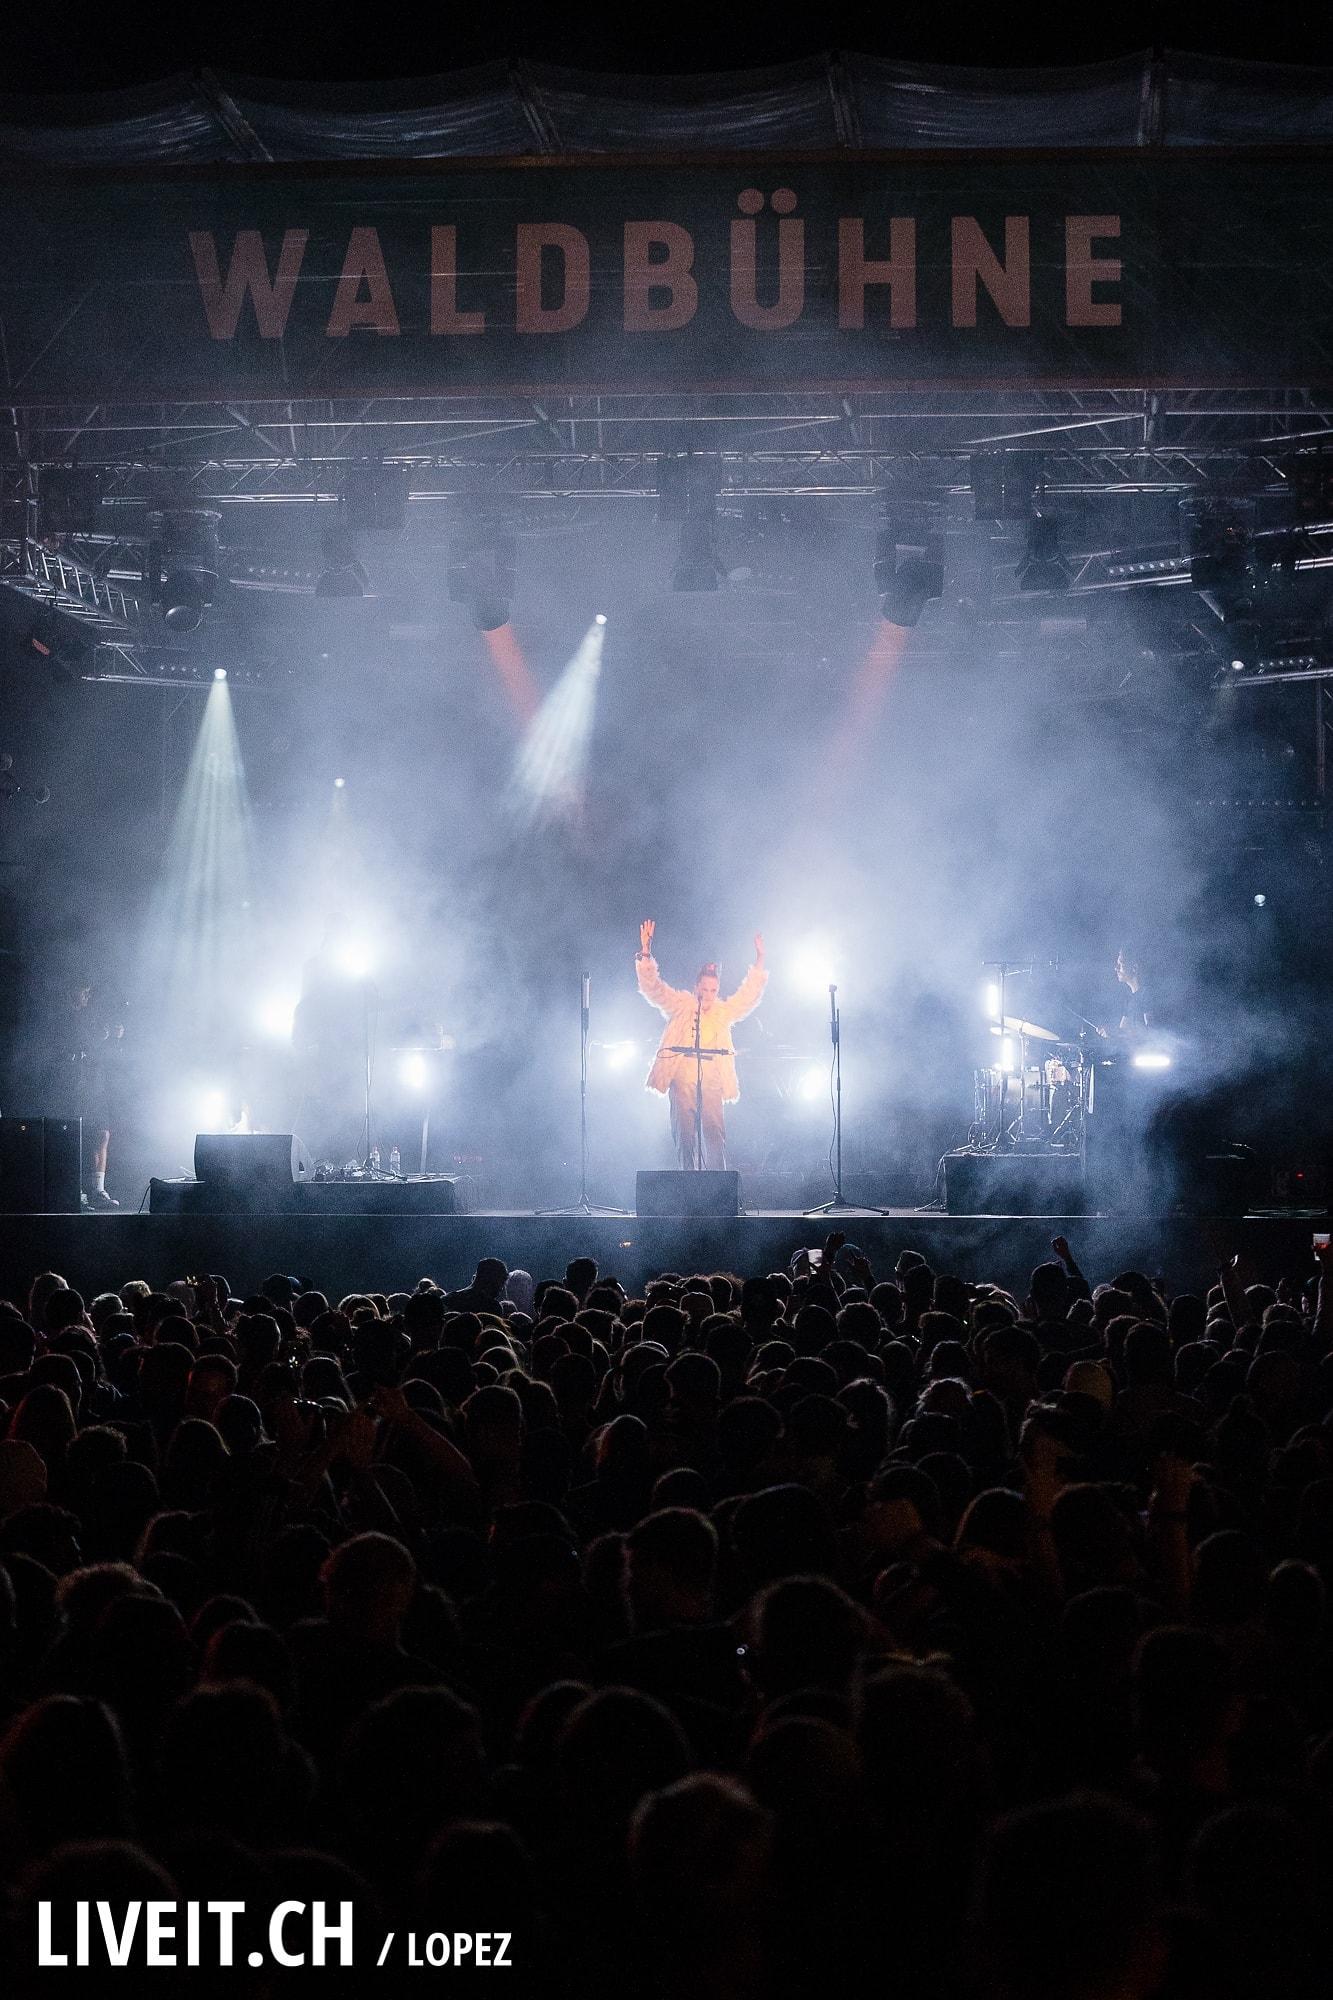 Pablo Nouvelle fotografiert am Gurtenfestival 2018 in Bern. (Manuel Lopez for Gurtenfestival)